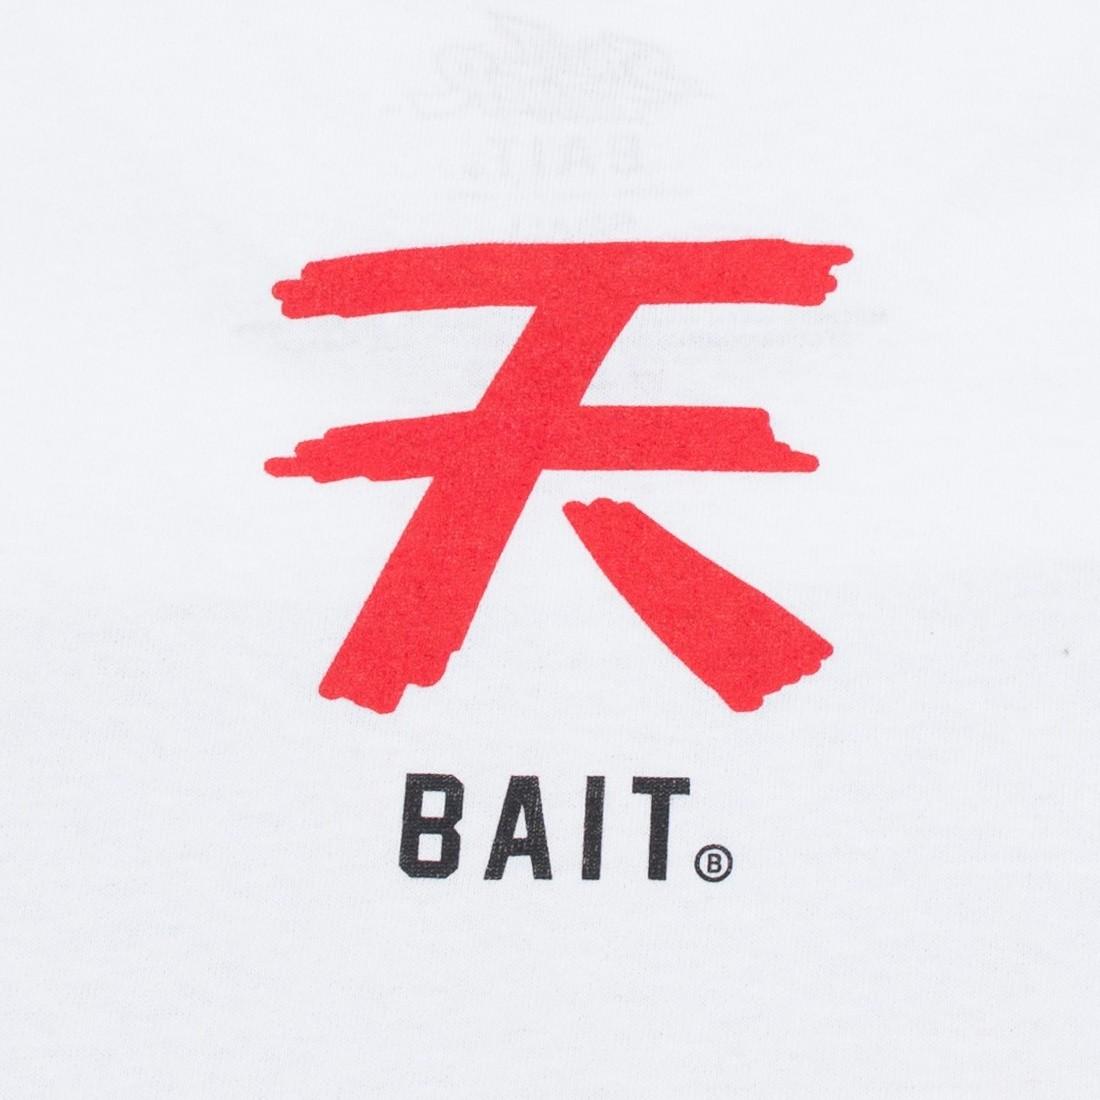 BAIT STREETFIGHTERxKIDOKYOAKUMASS - 197-STF-TEE-003